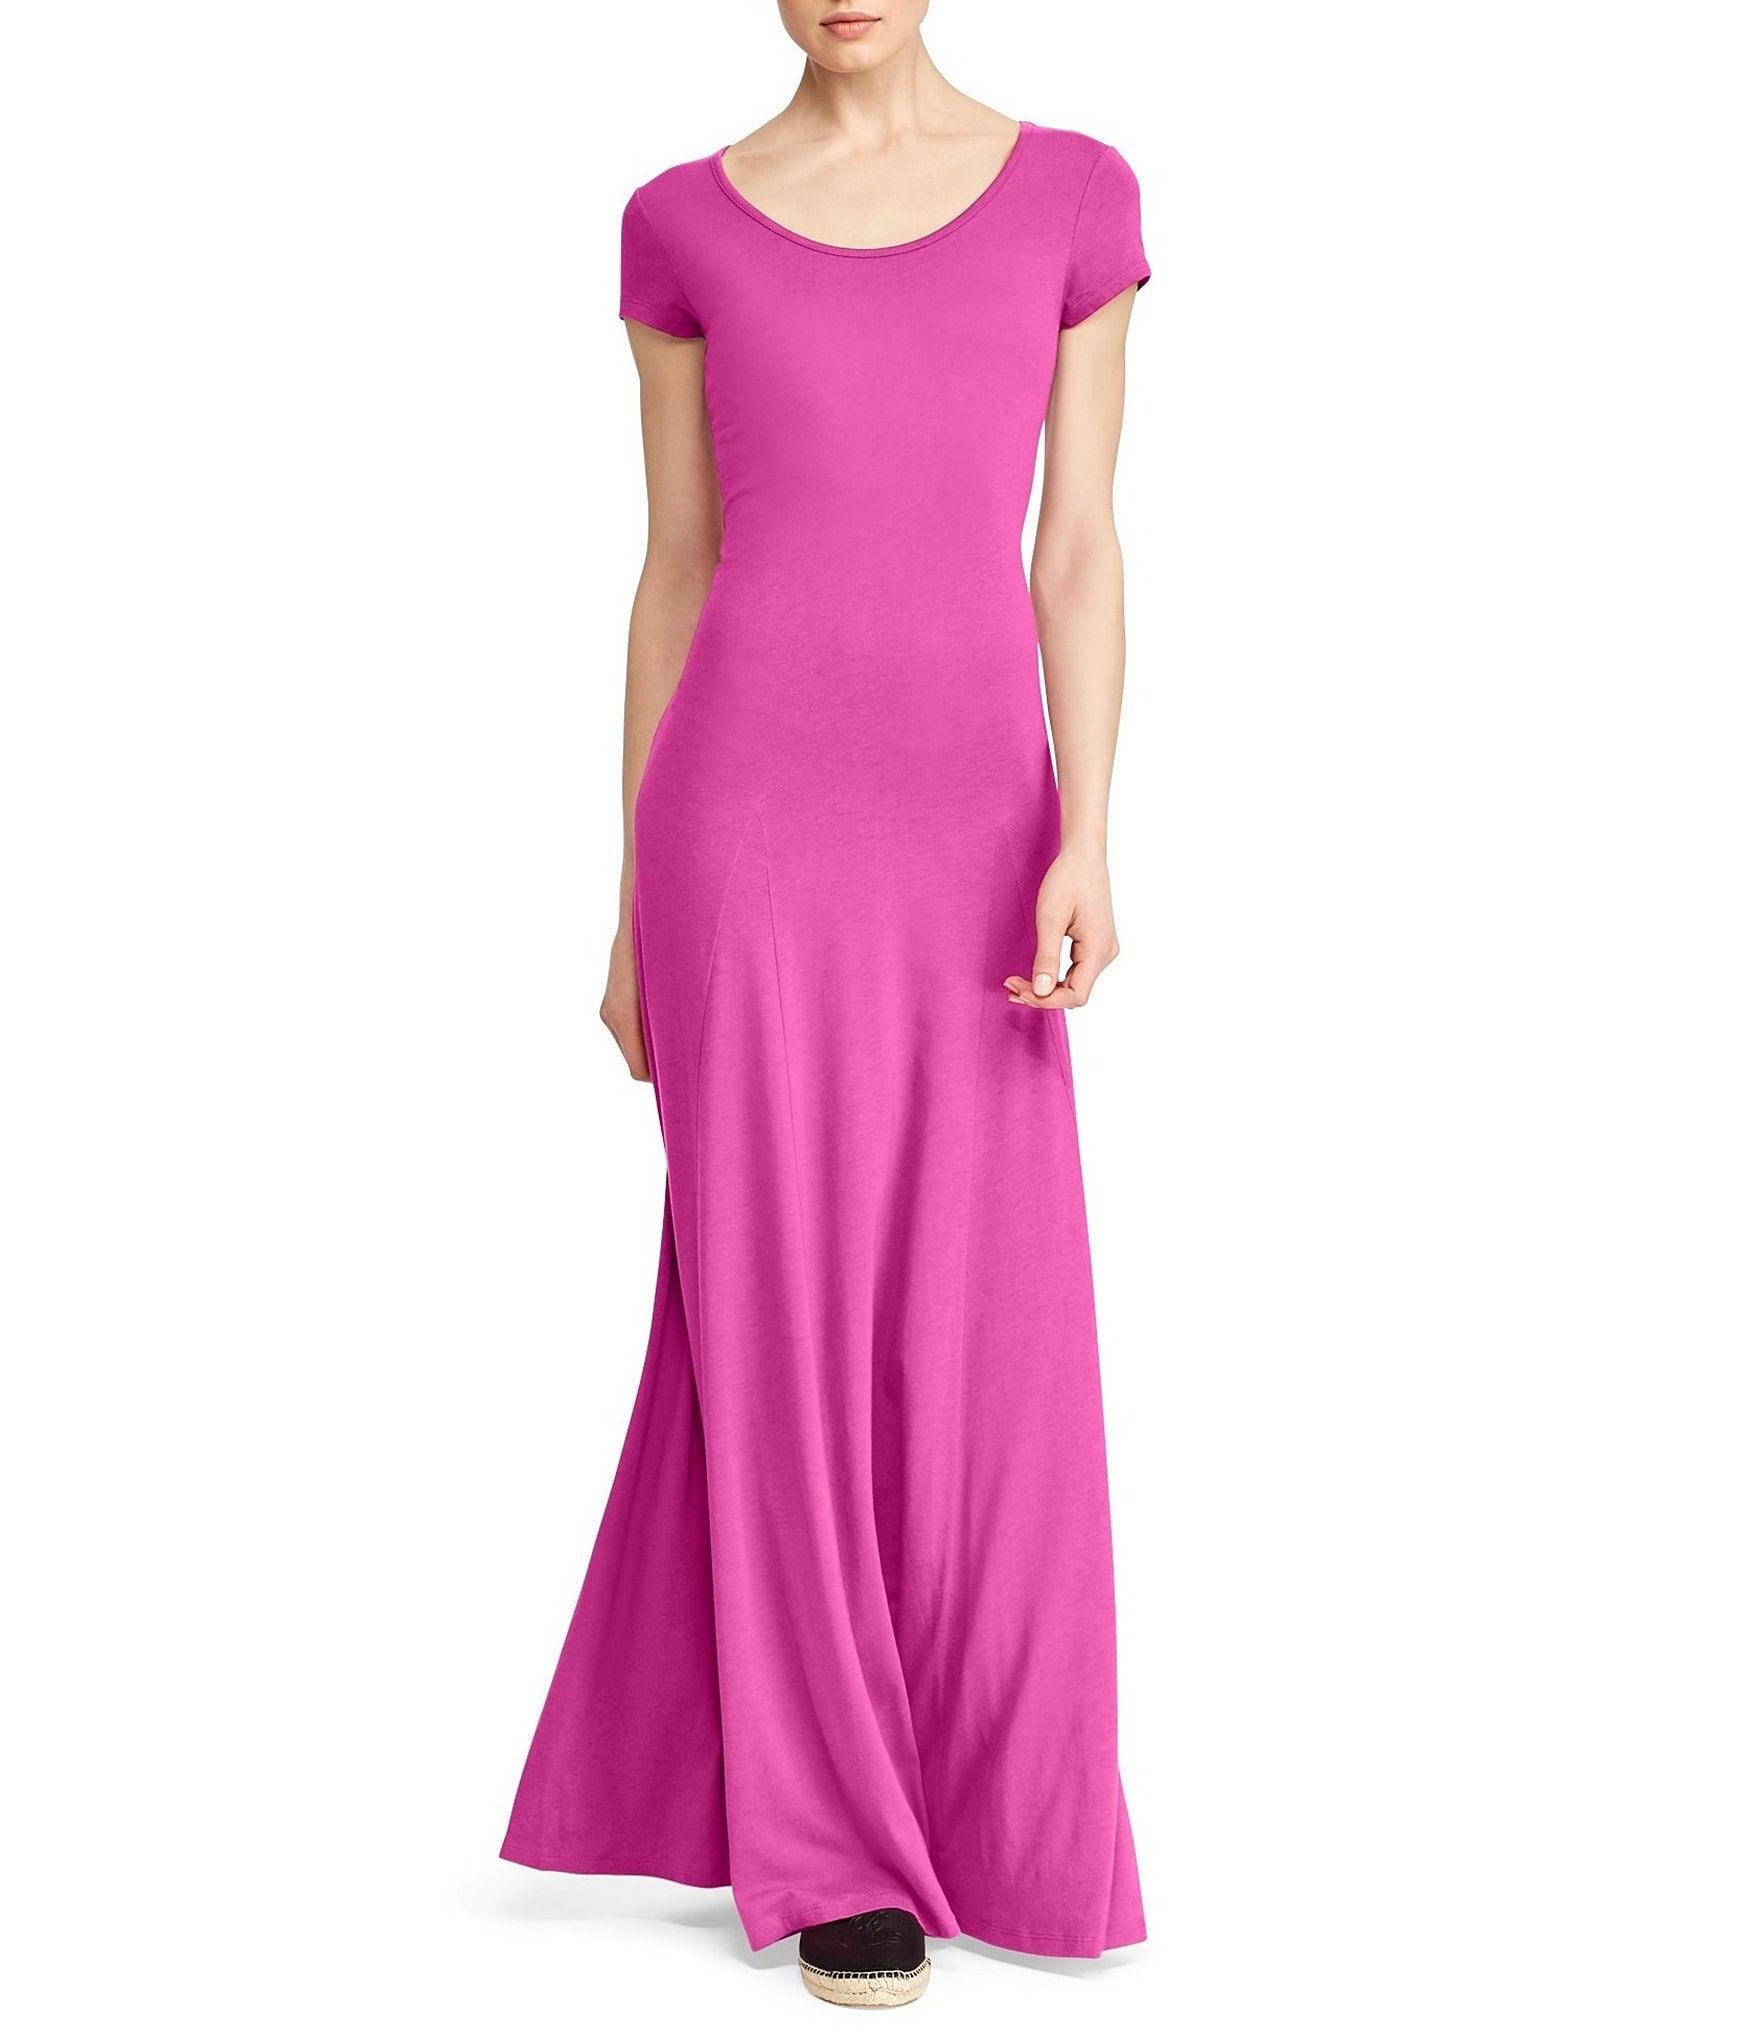 clearance dresses: Women\'s Petite Clothing | Dillards.com